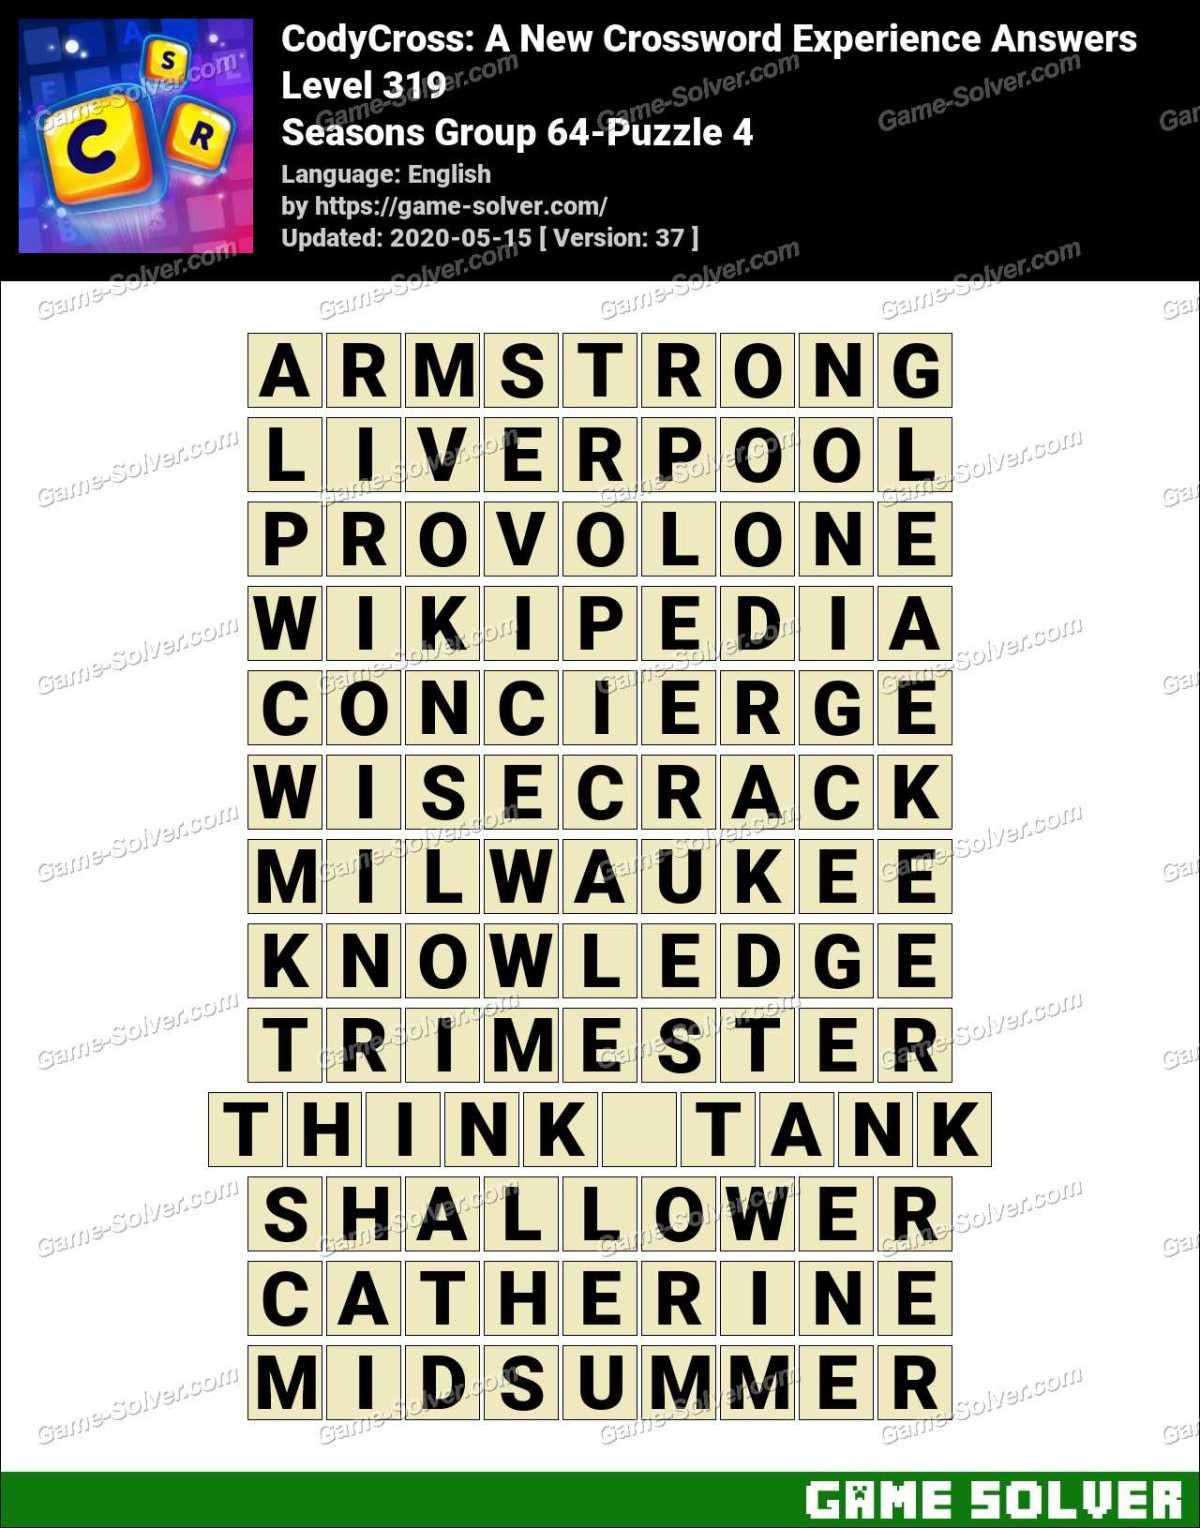 CodyCross Seasons Group 64-Puzzle 4 Answers